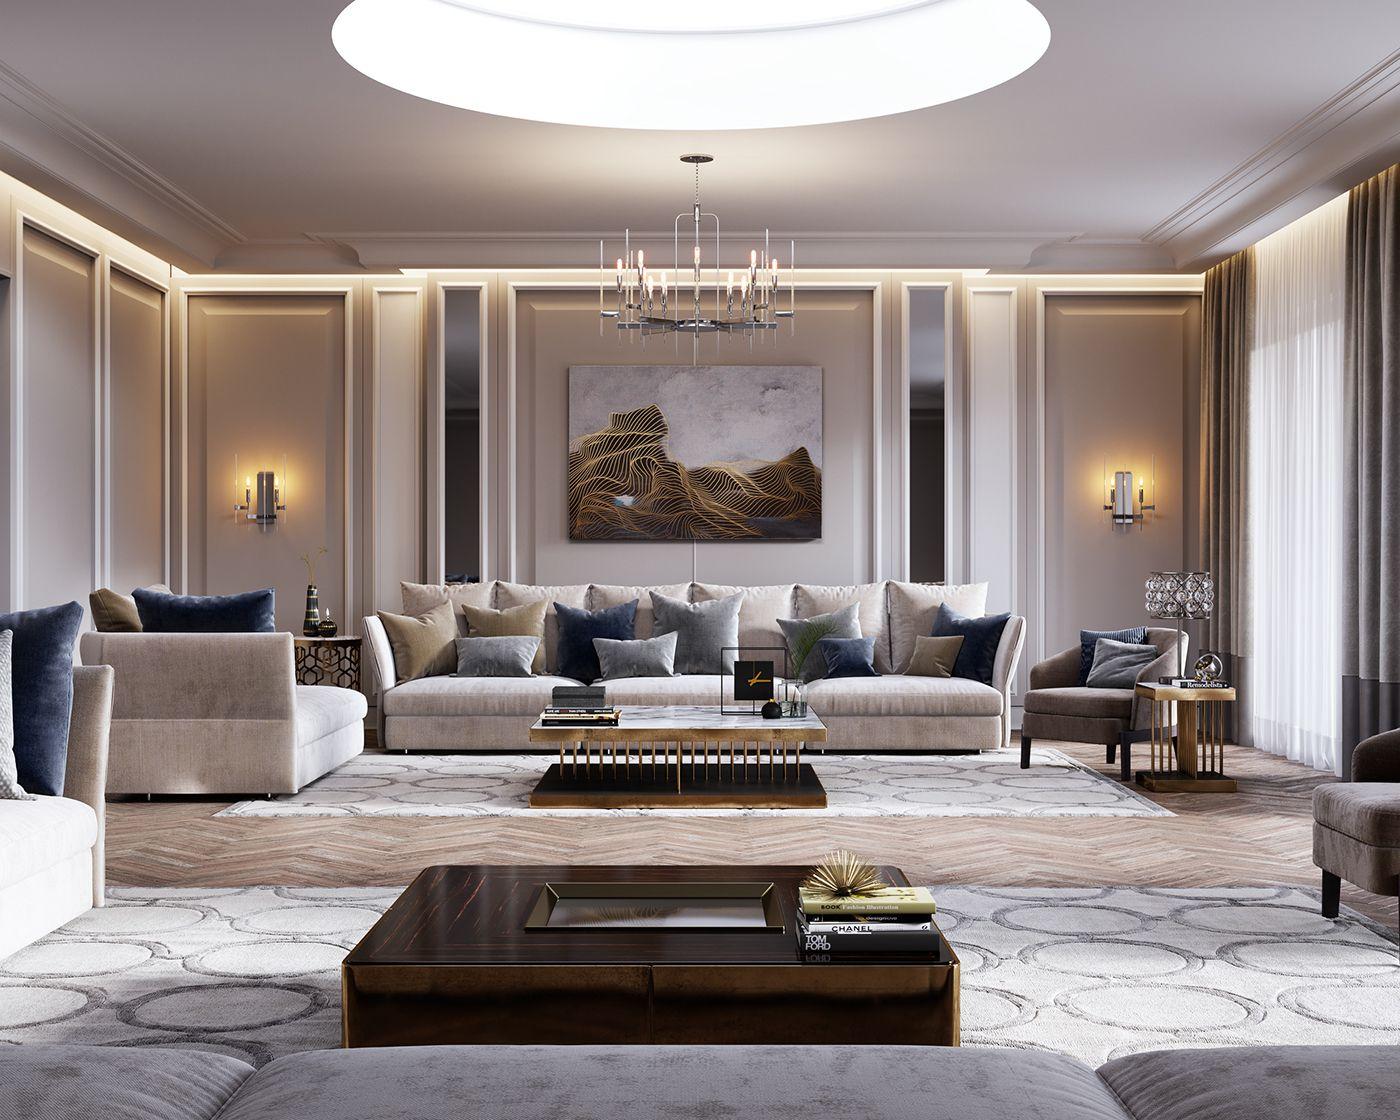 marvelous modern classic living room ideas | Apartments in Saudi ArabiaDesign and Visualization ...